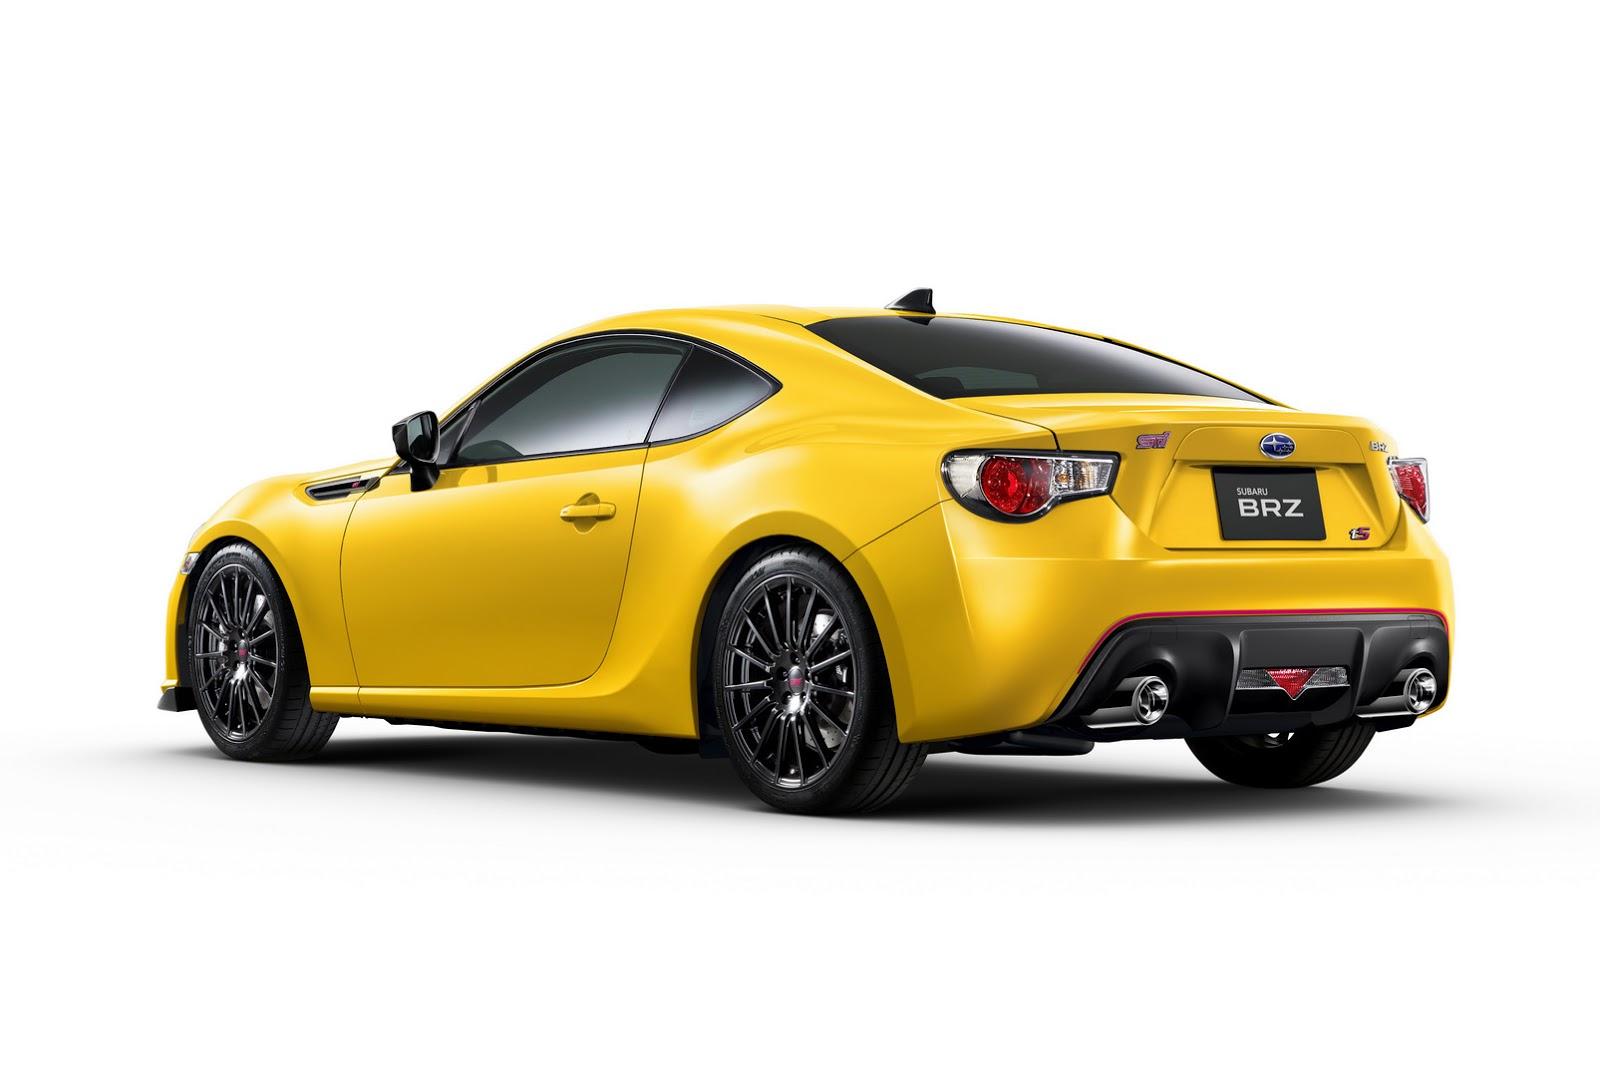 Japan Gets New 2015 Subaru BRZ tS By STI | Carscoops